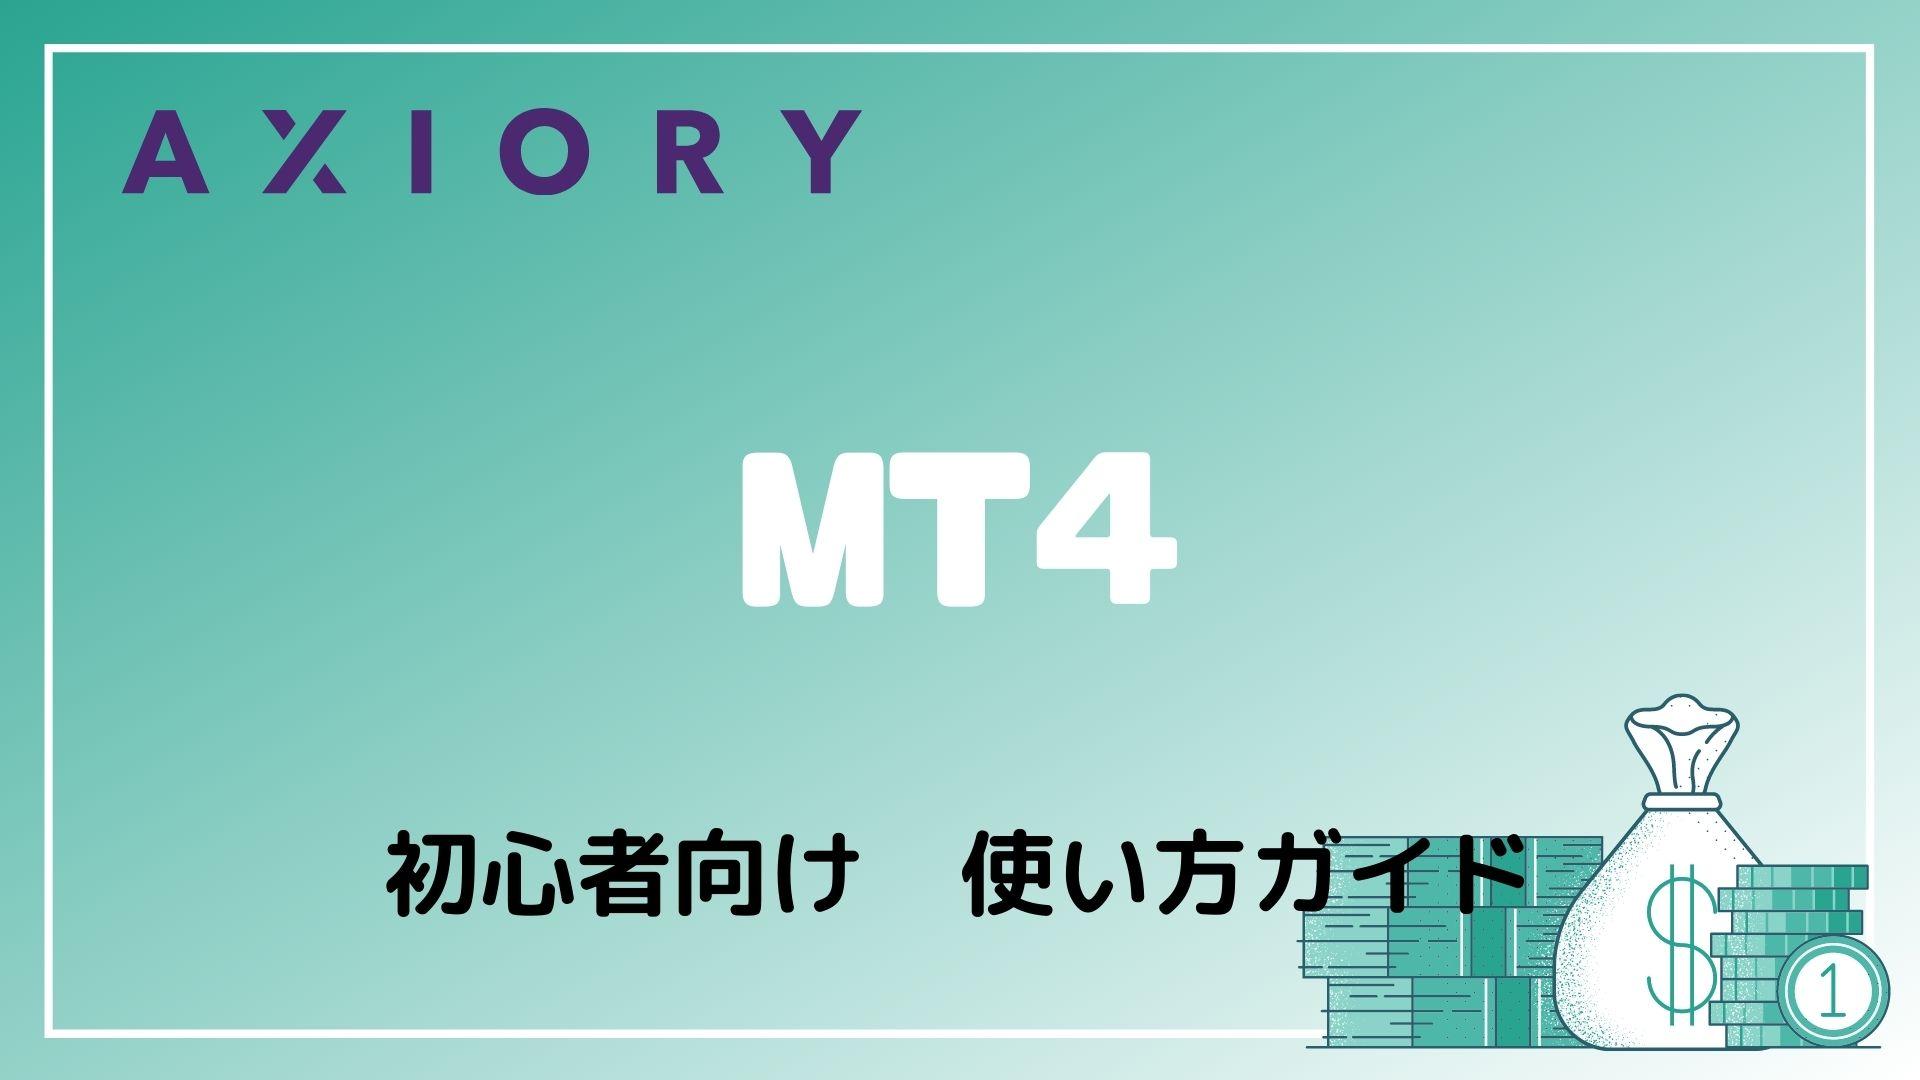 axiory-mt4-title